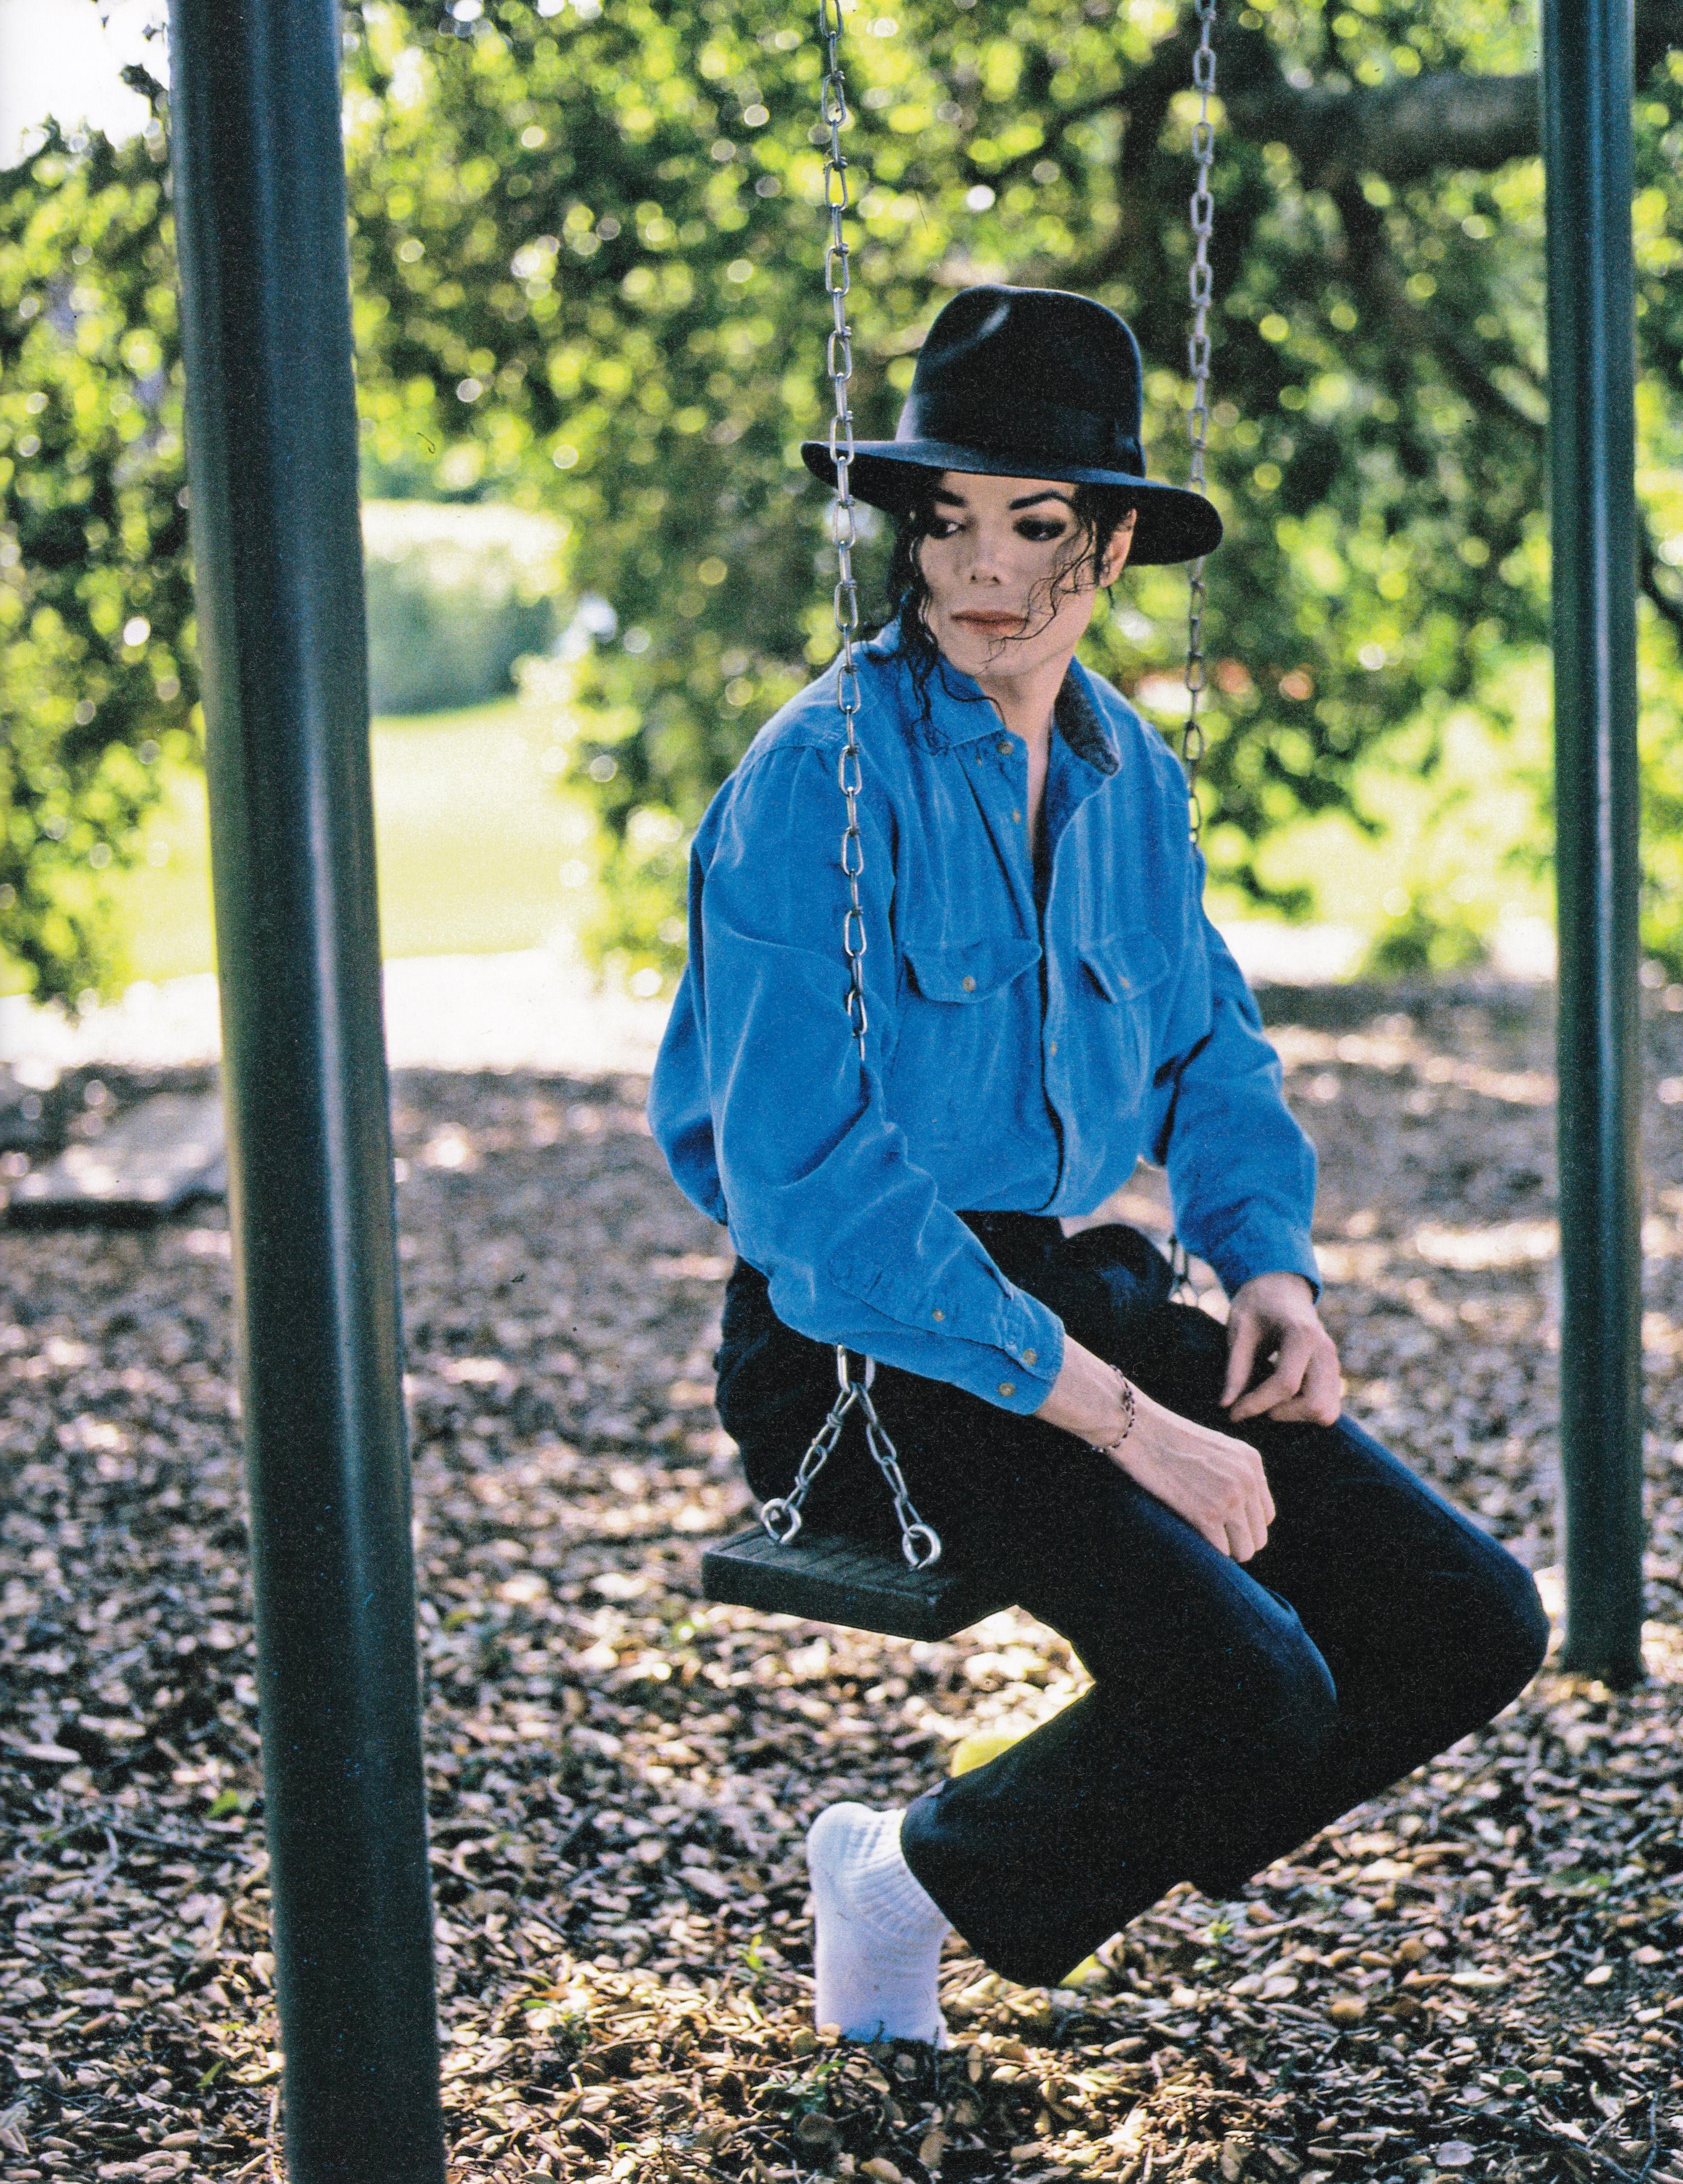 Michael Jackson - HQ Scan - Neverland Photosession - Harry Benson (1993)